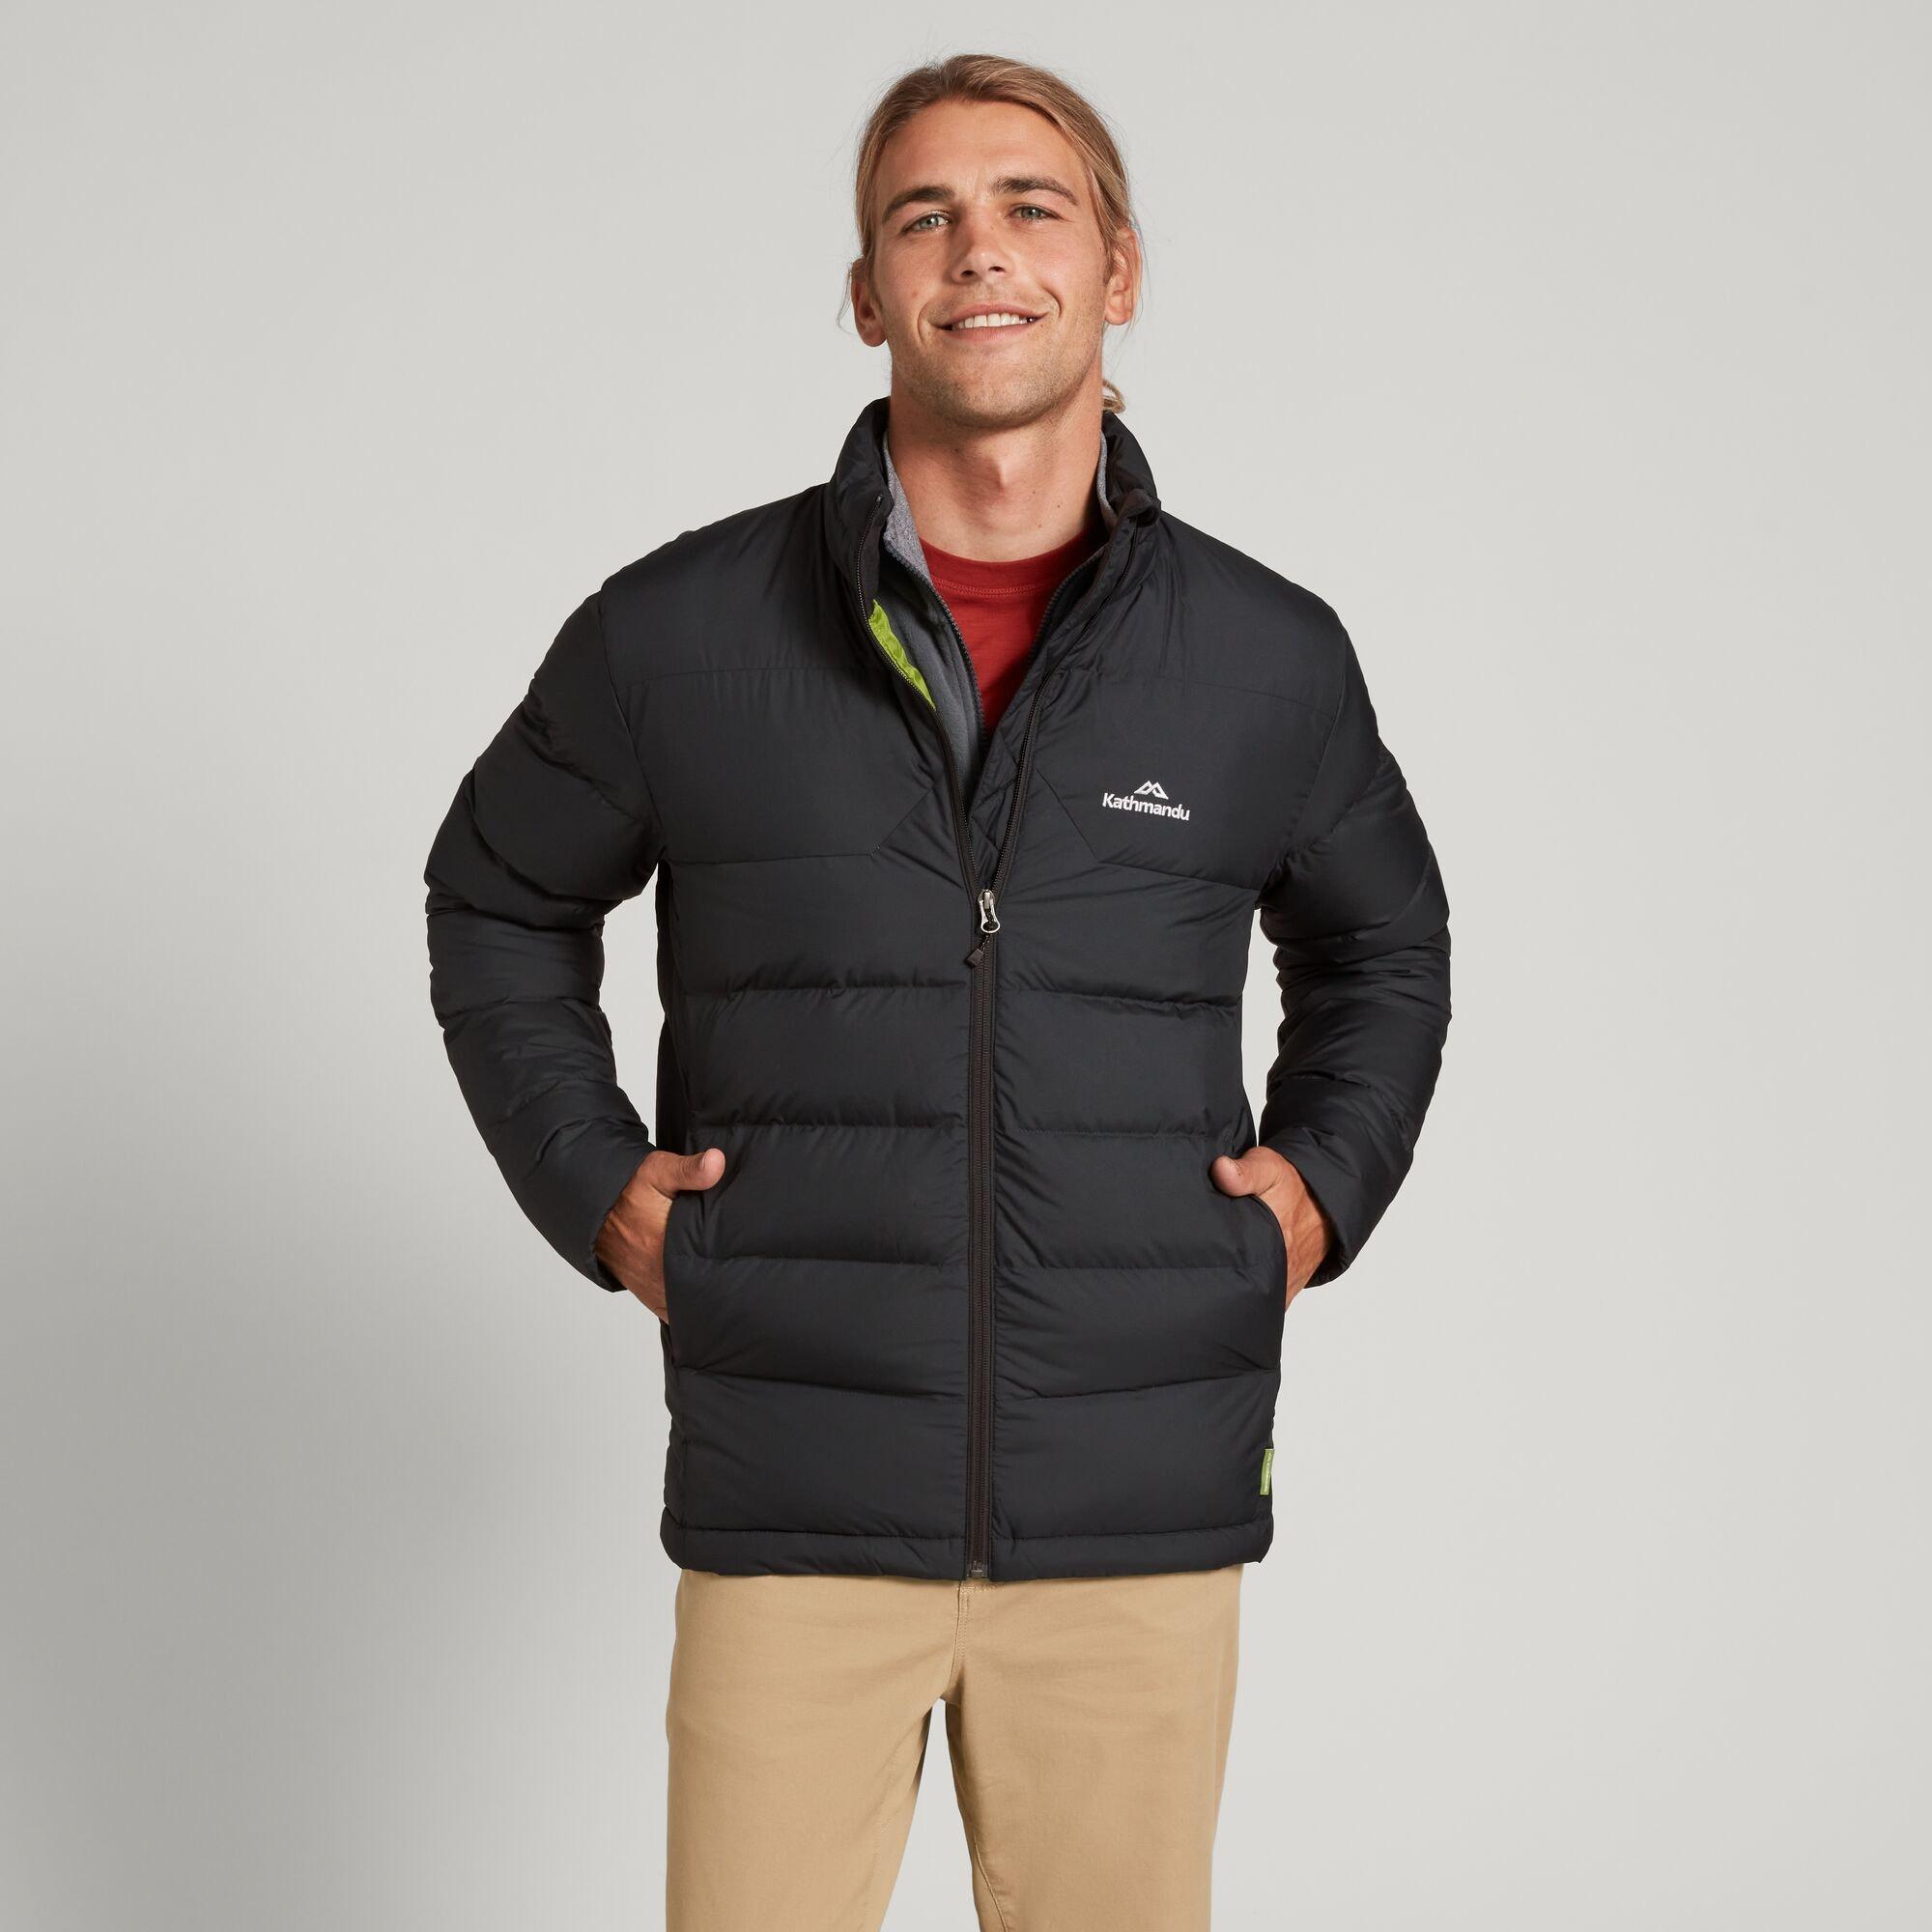 thumbnail 13 - NEW Kathmandu Epiq Mens 600 Fill Down Puffer Warm Outdoor Winter Jacket